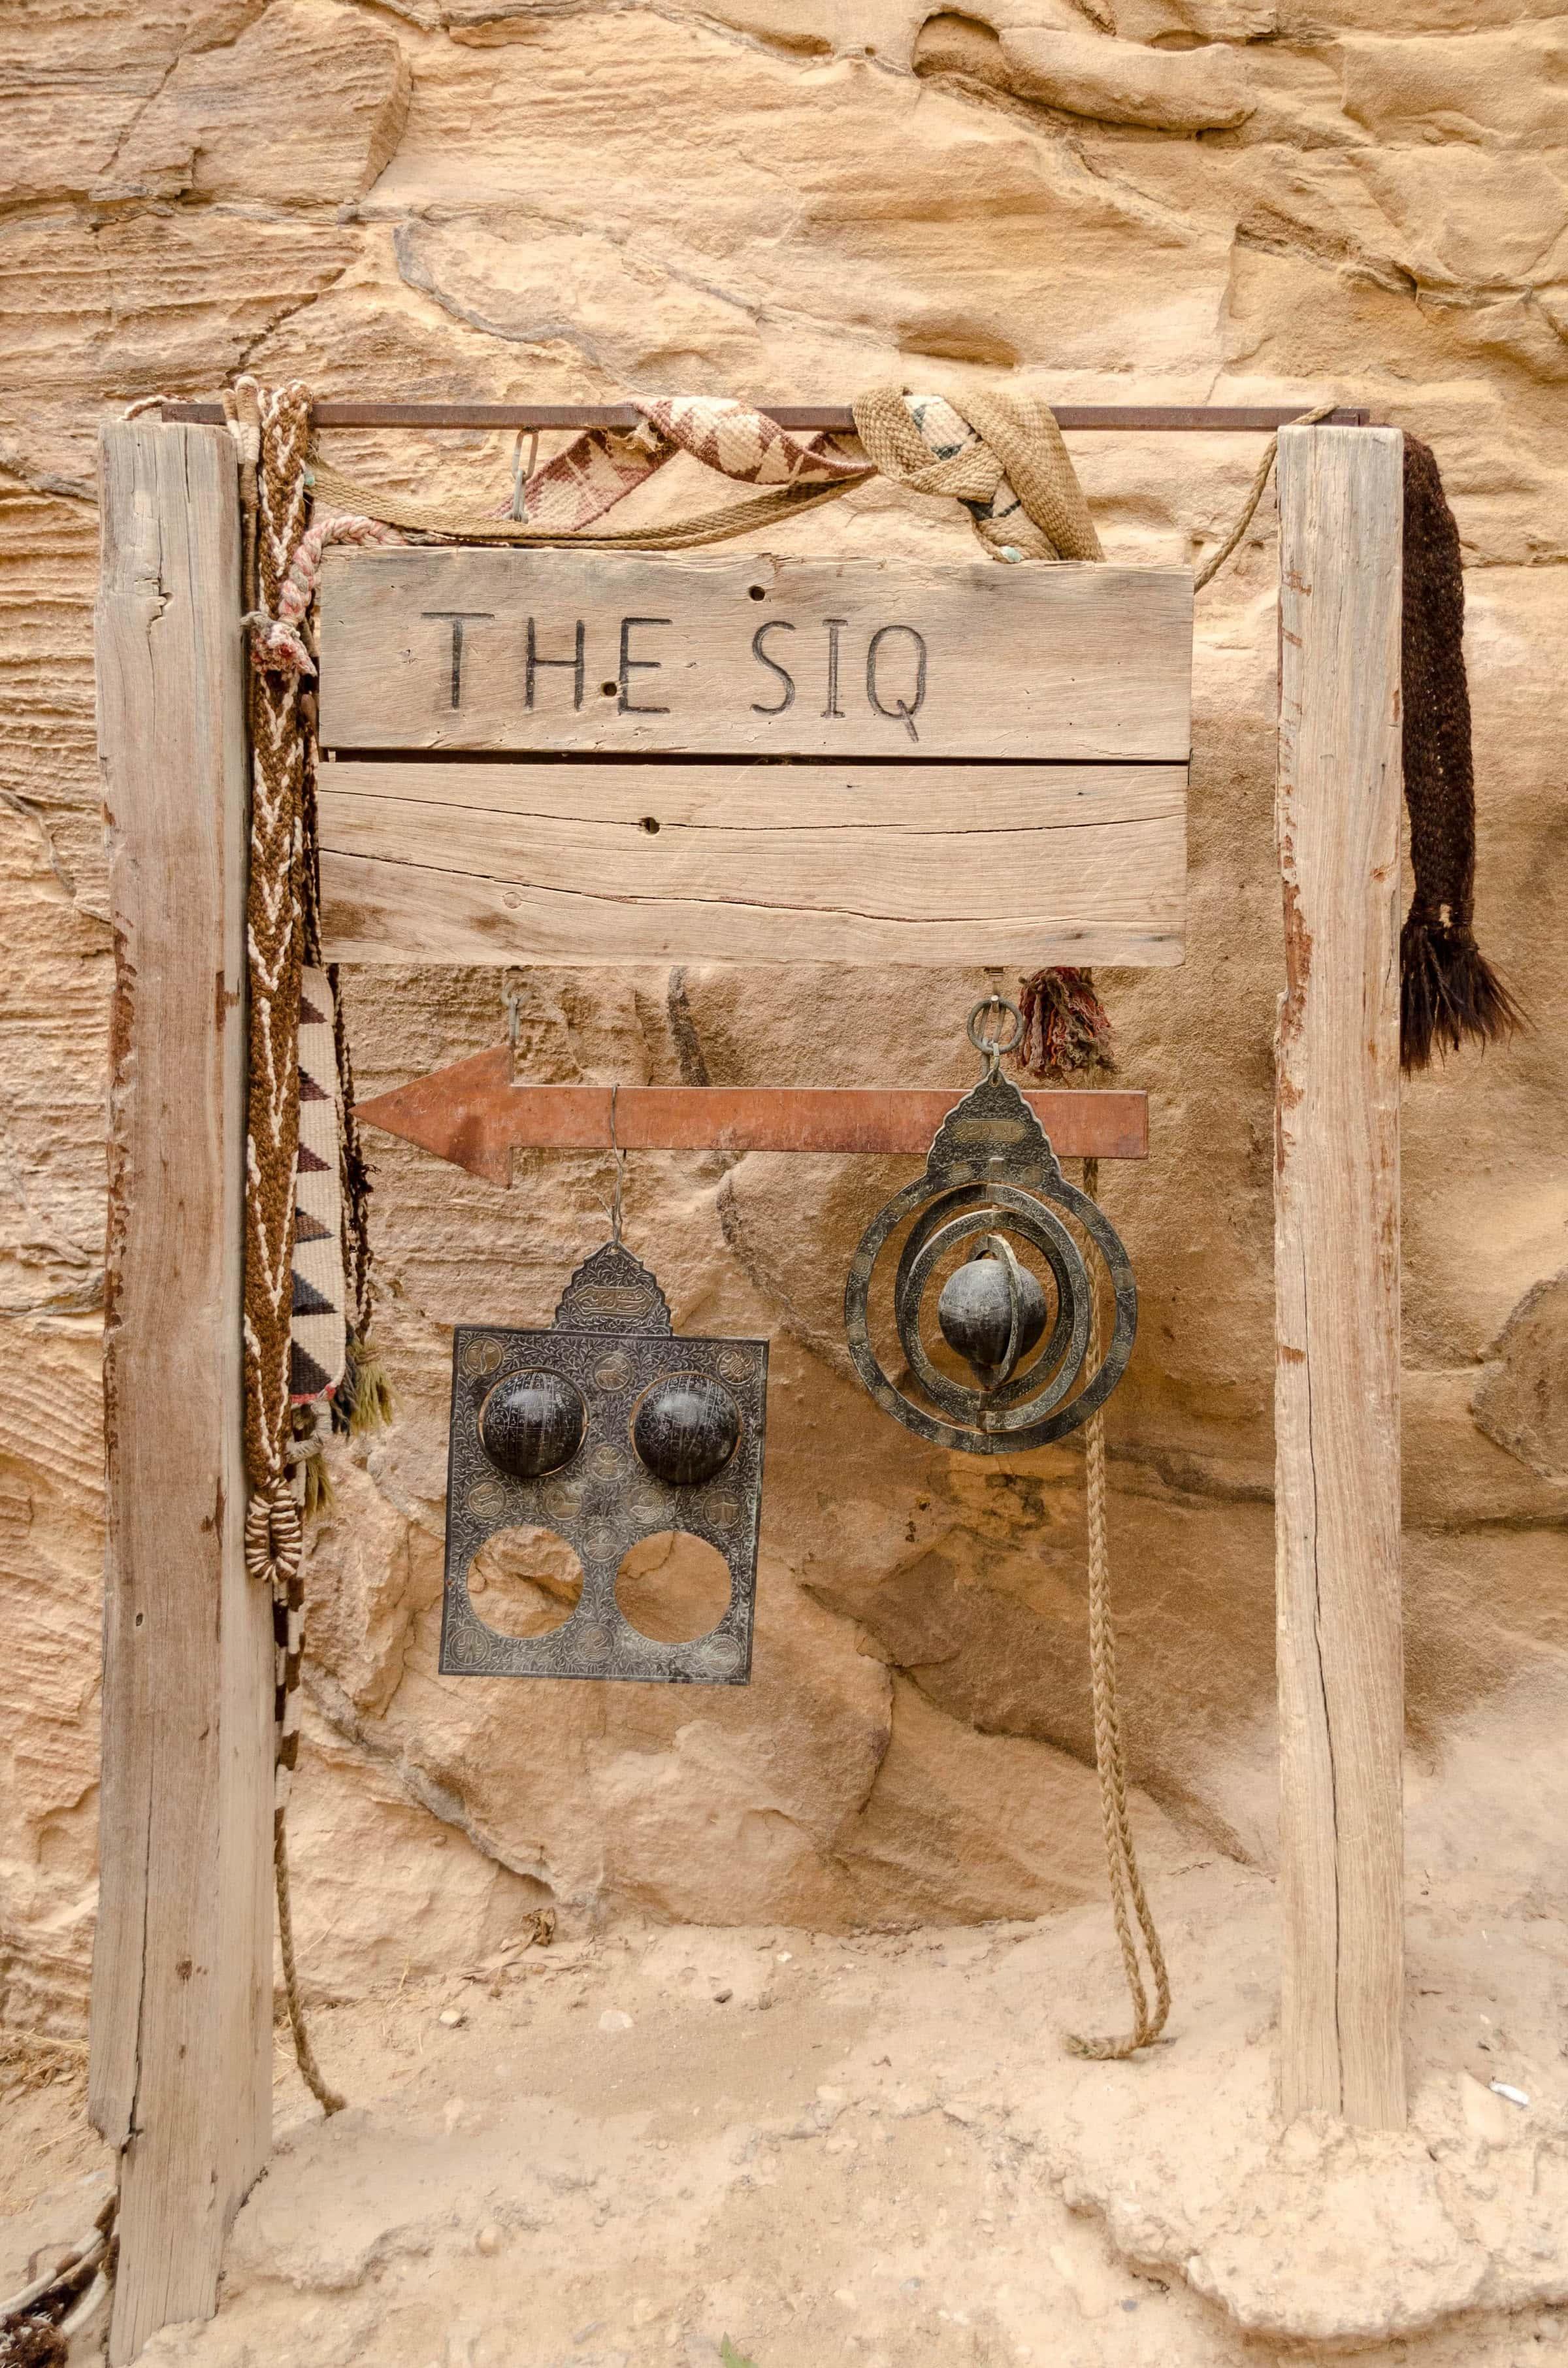 Eingang zum Siq in Petra